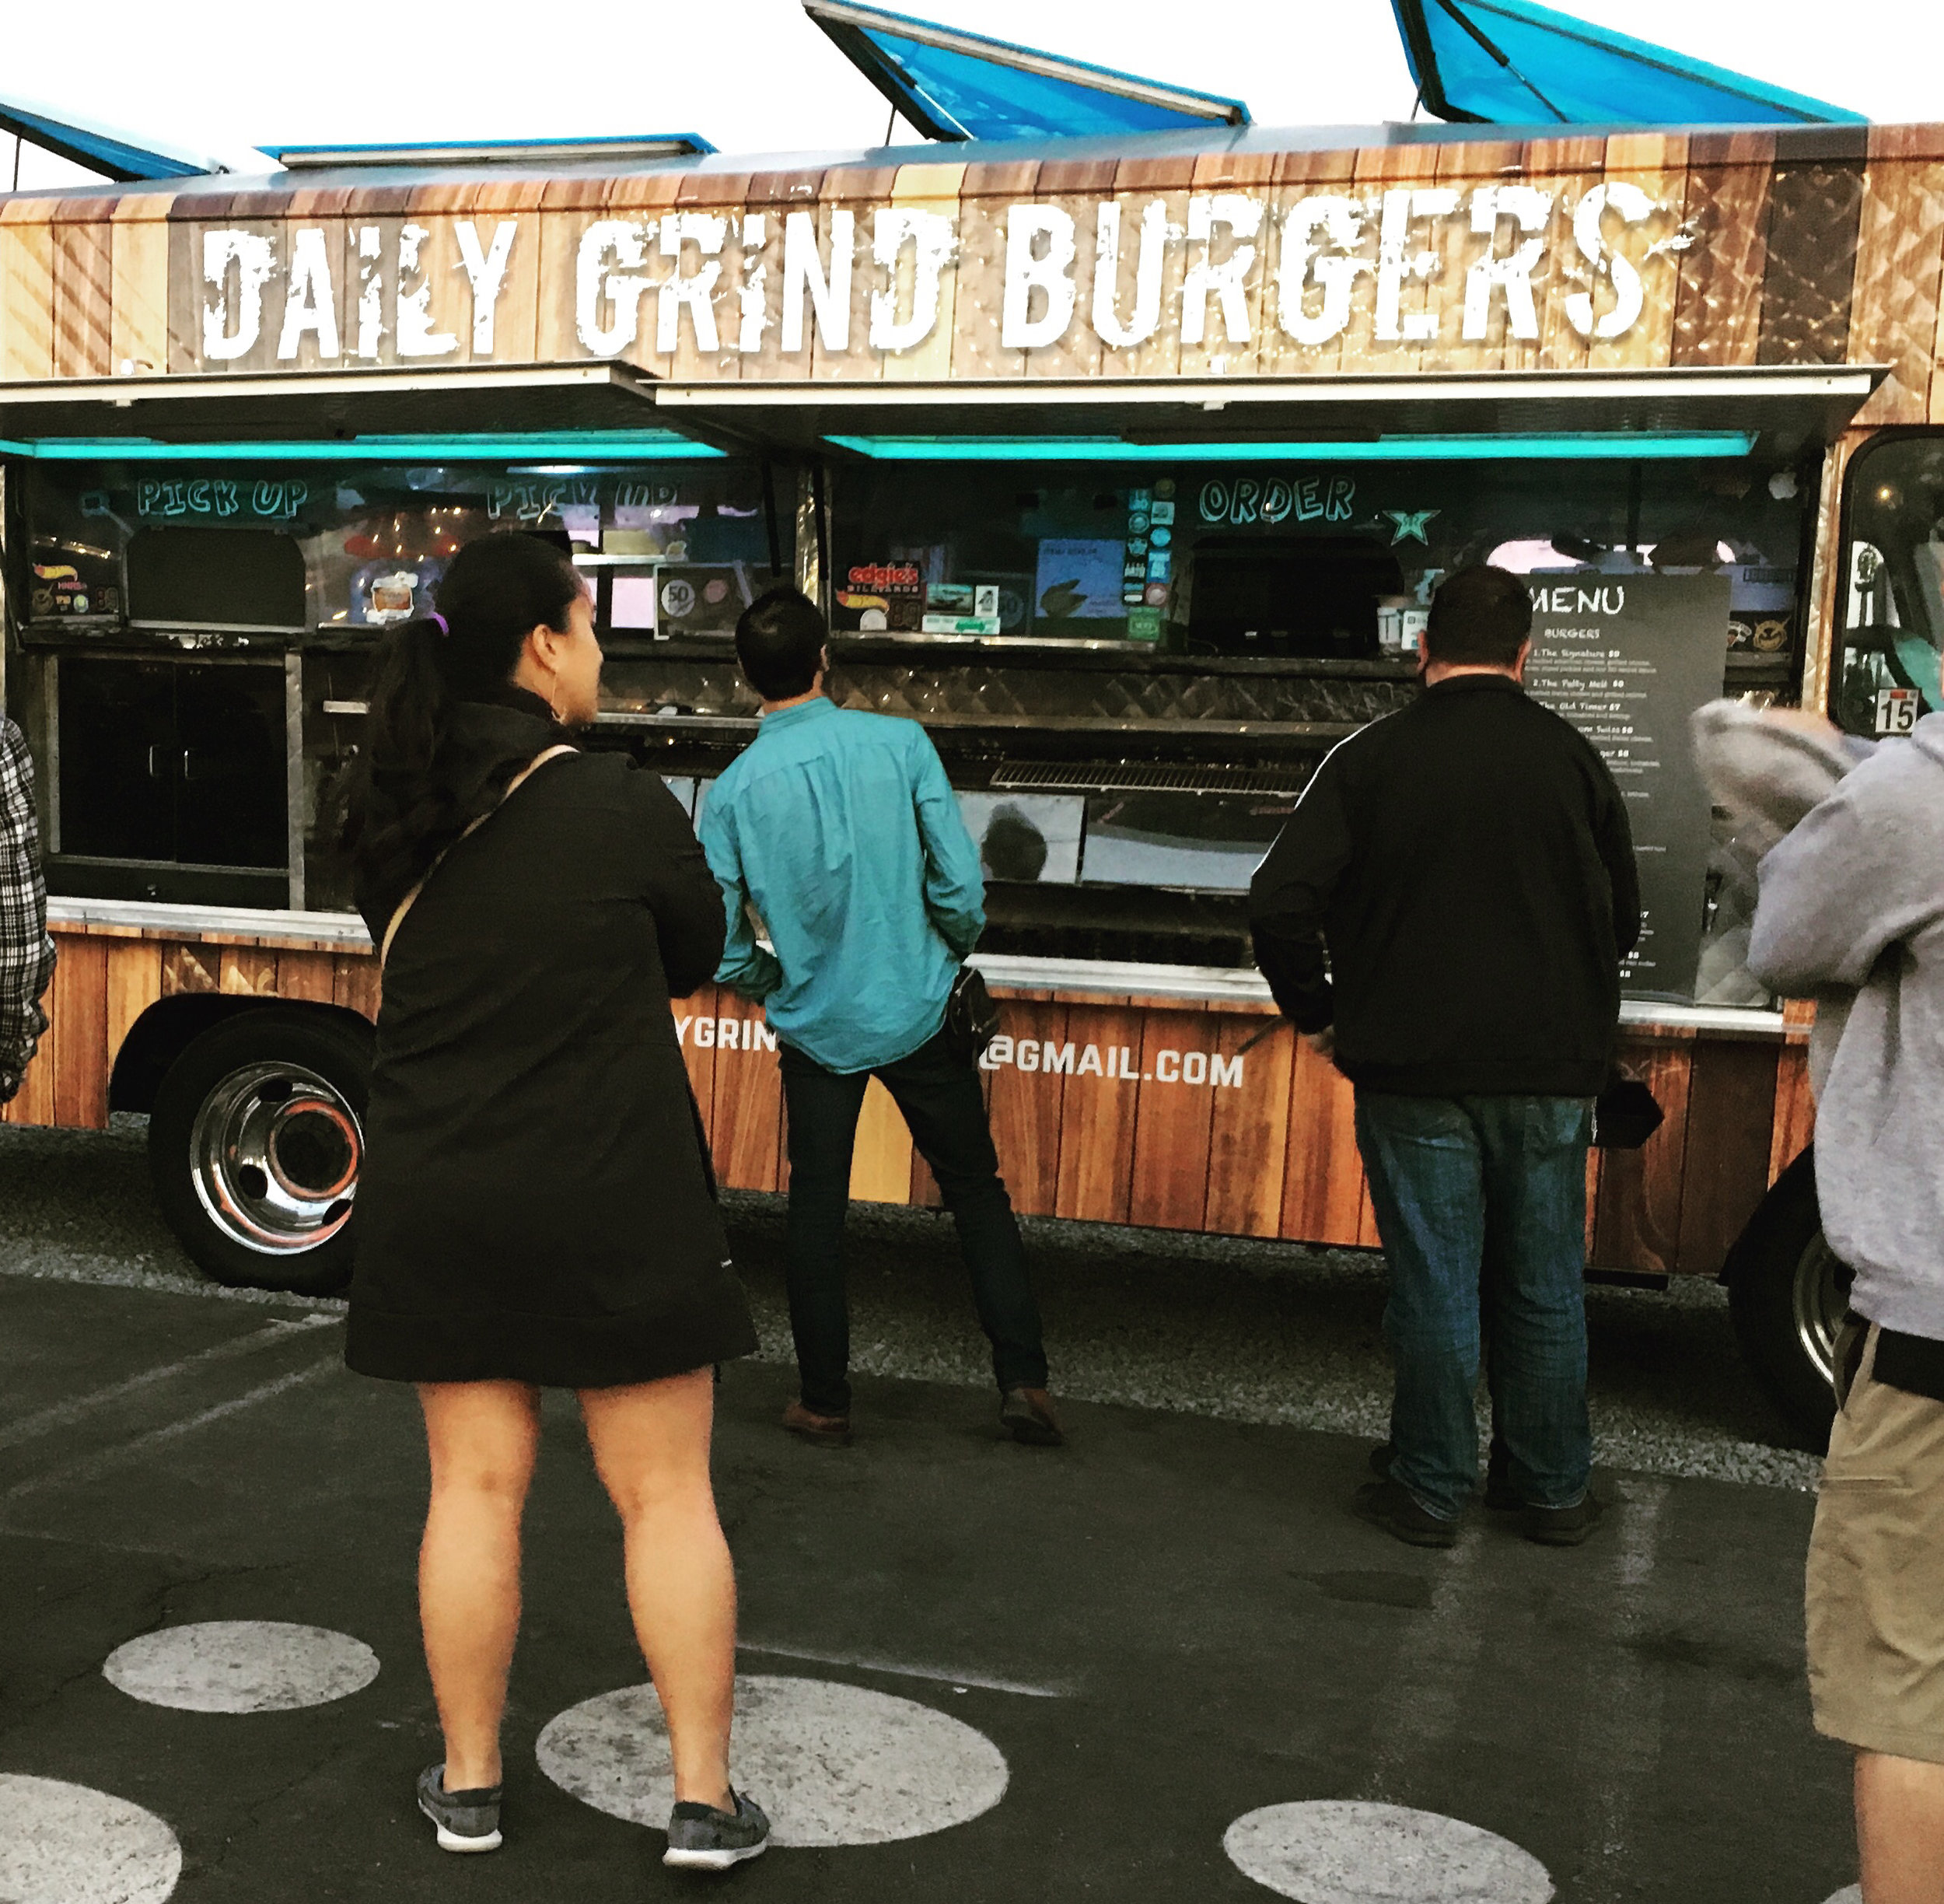 Daily Grind Burgers.jpg